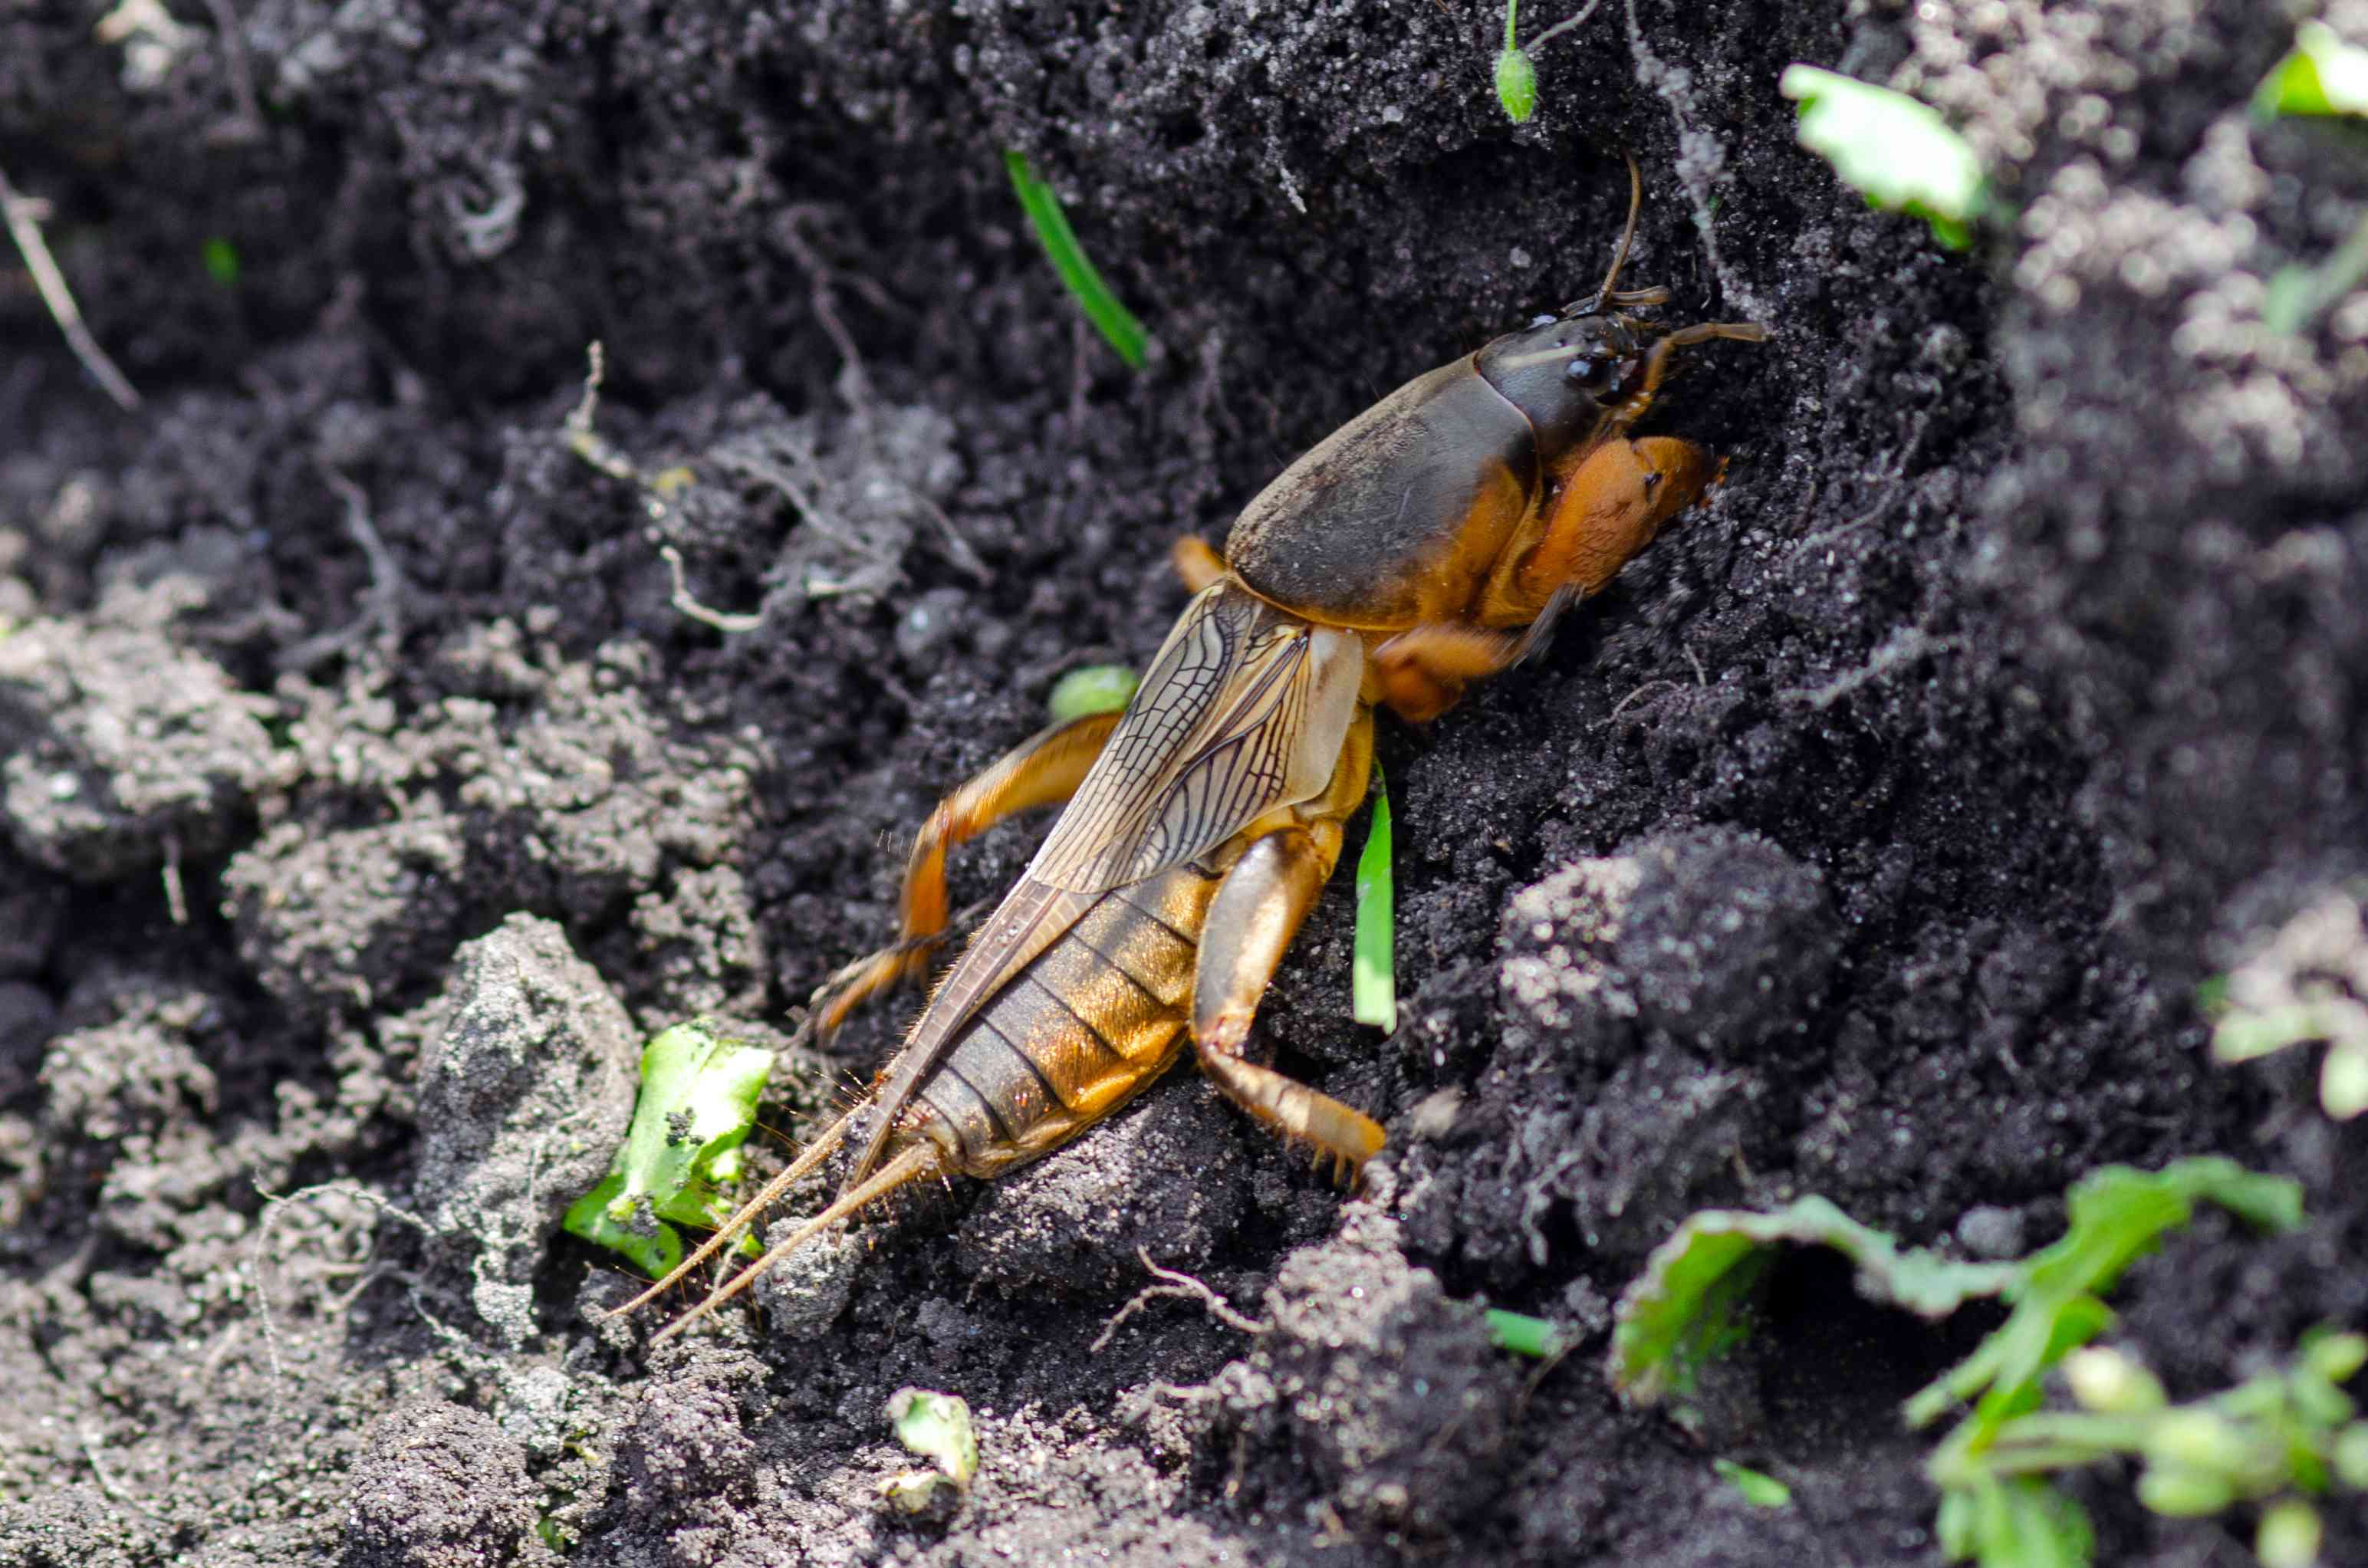 long brown and tan mole cricket climbs through dirt